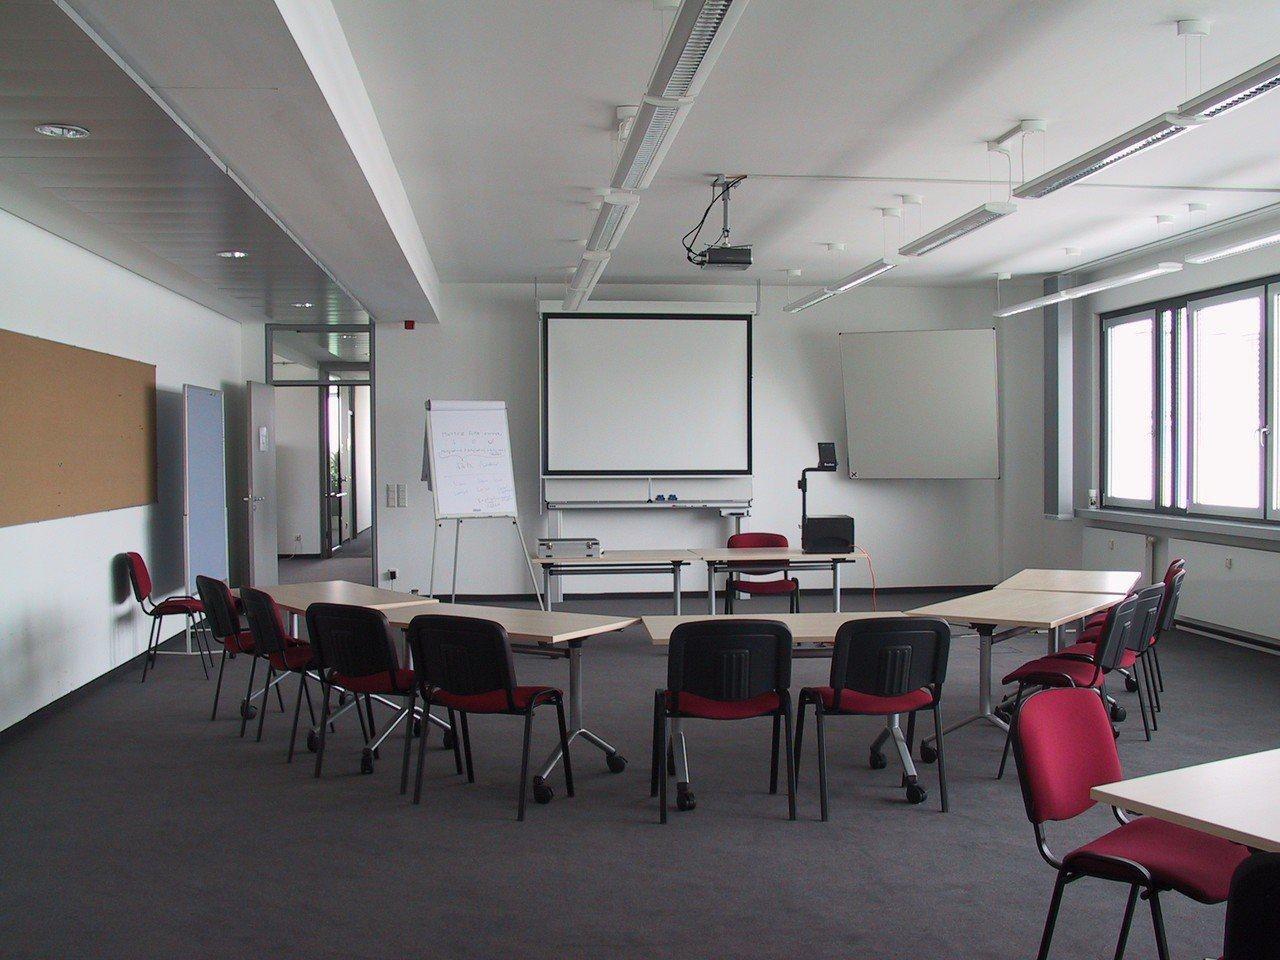 Nürnberg Seminarräume Meetingraum GIB Institut Plenarraum (1) image 0